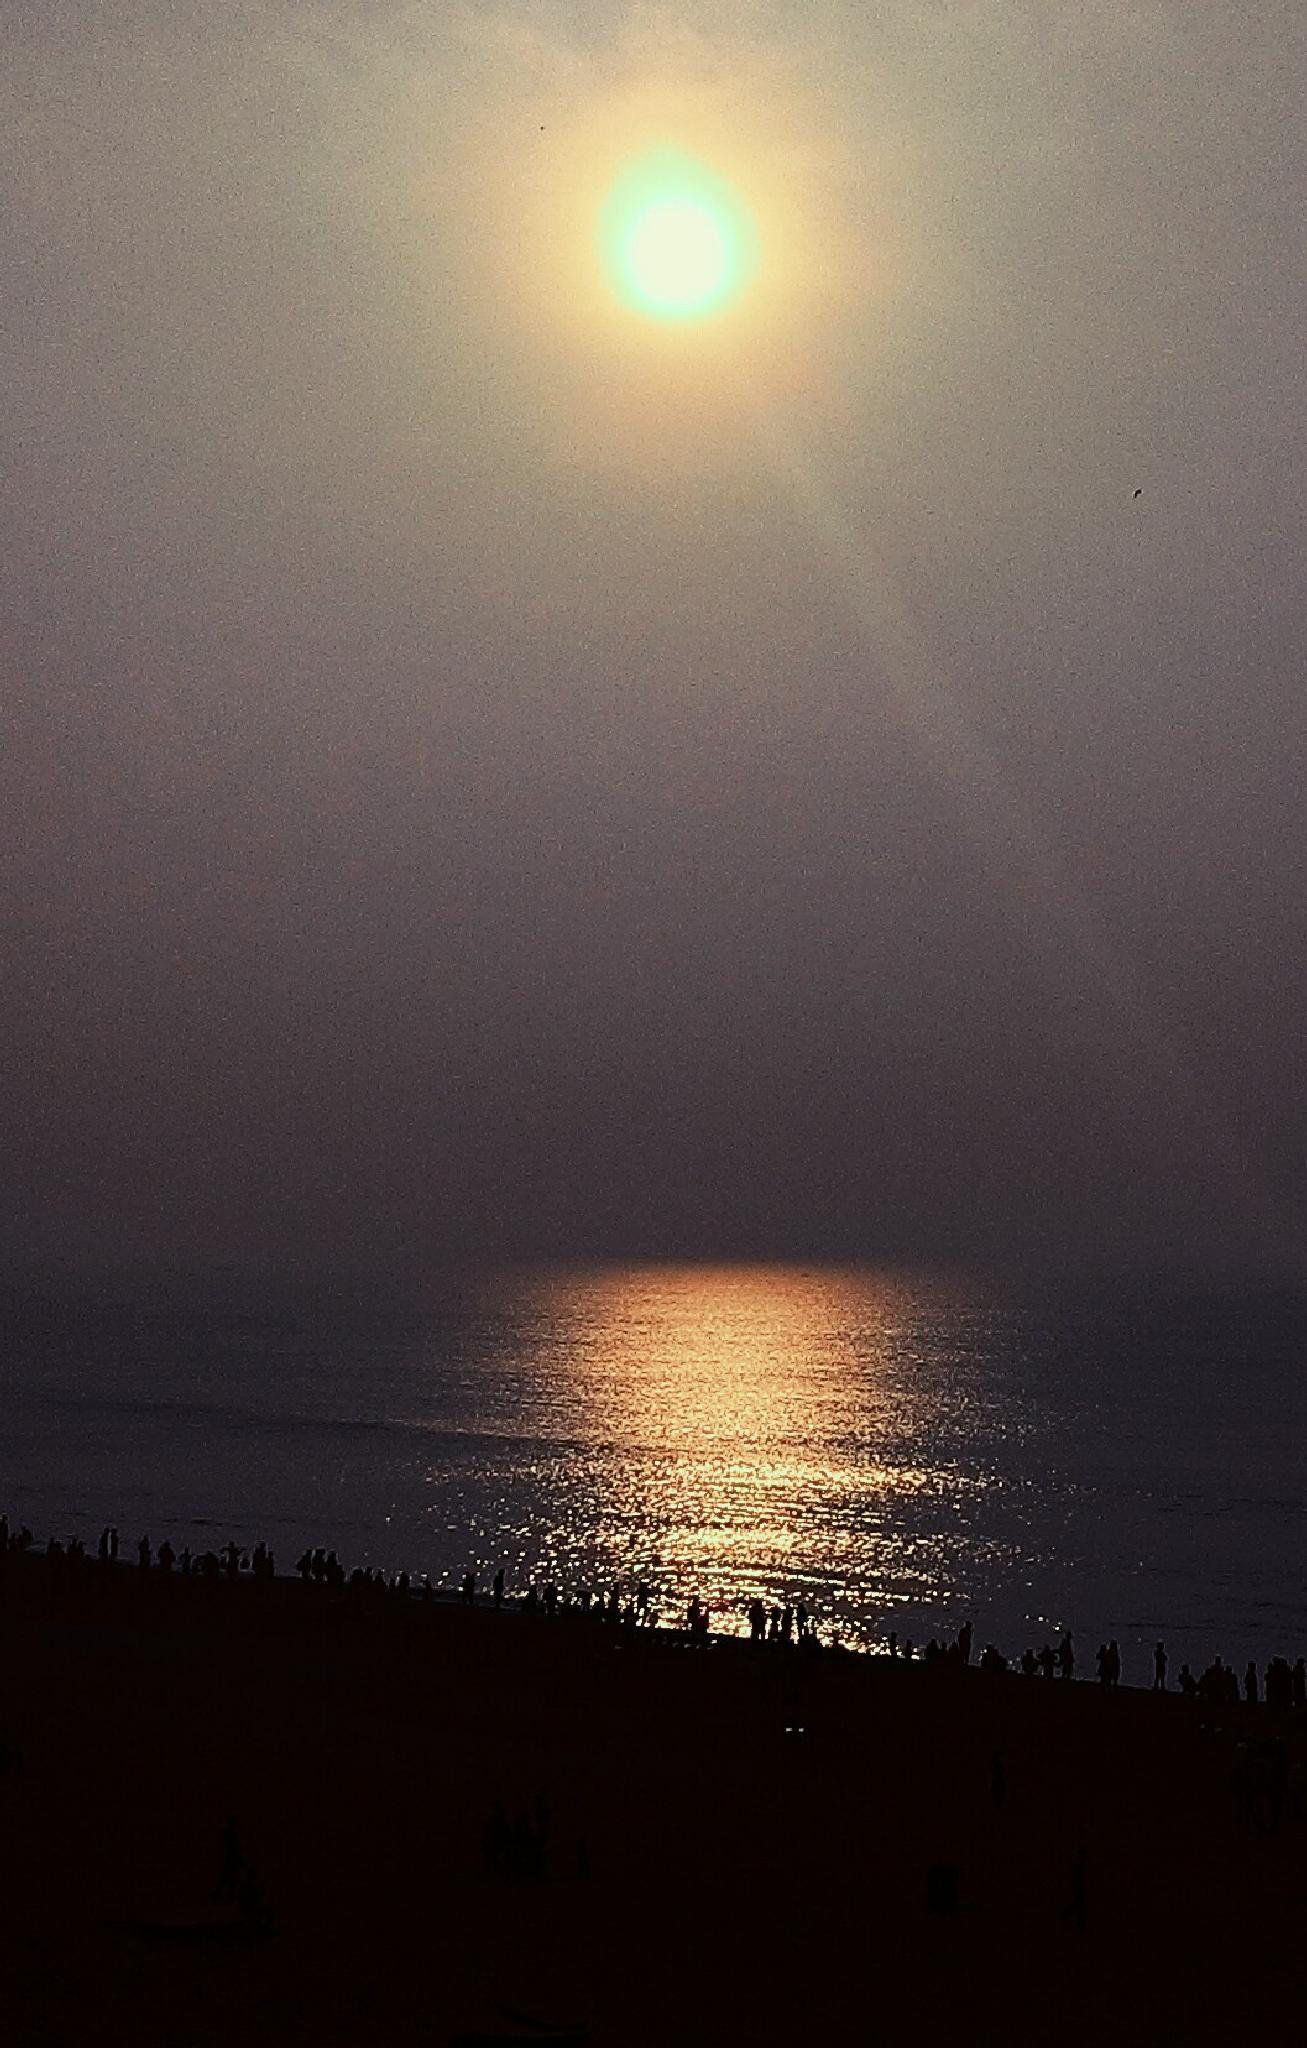 Sunset in puri by sayantan.bestfriend